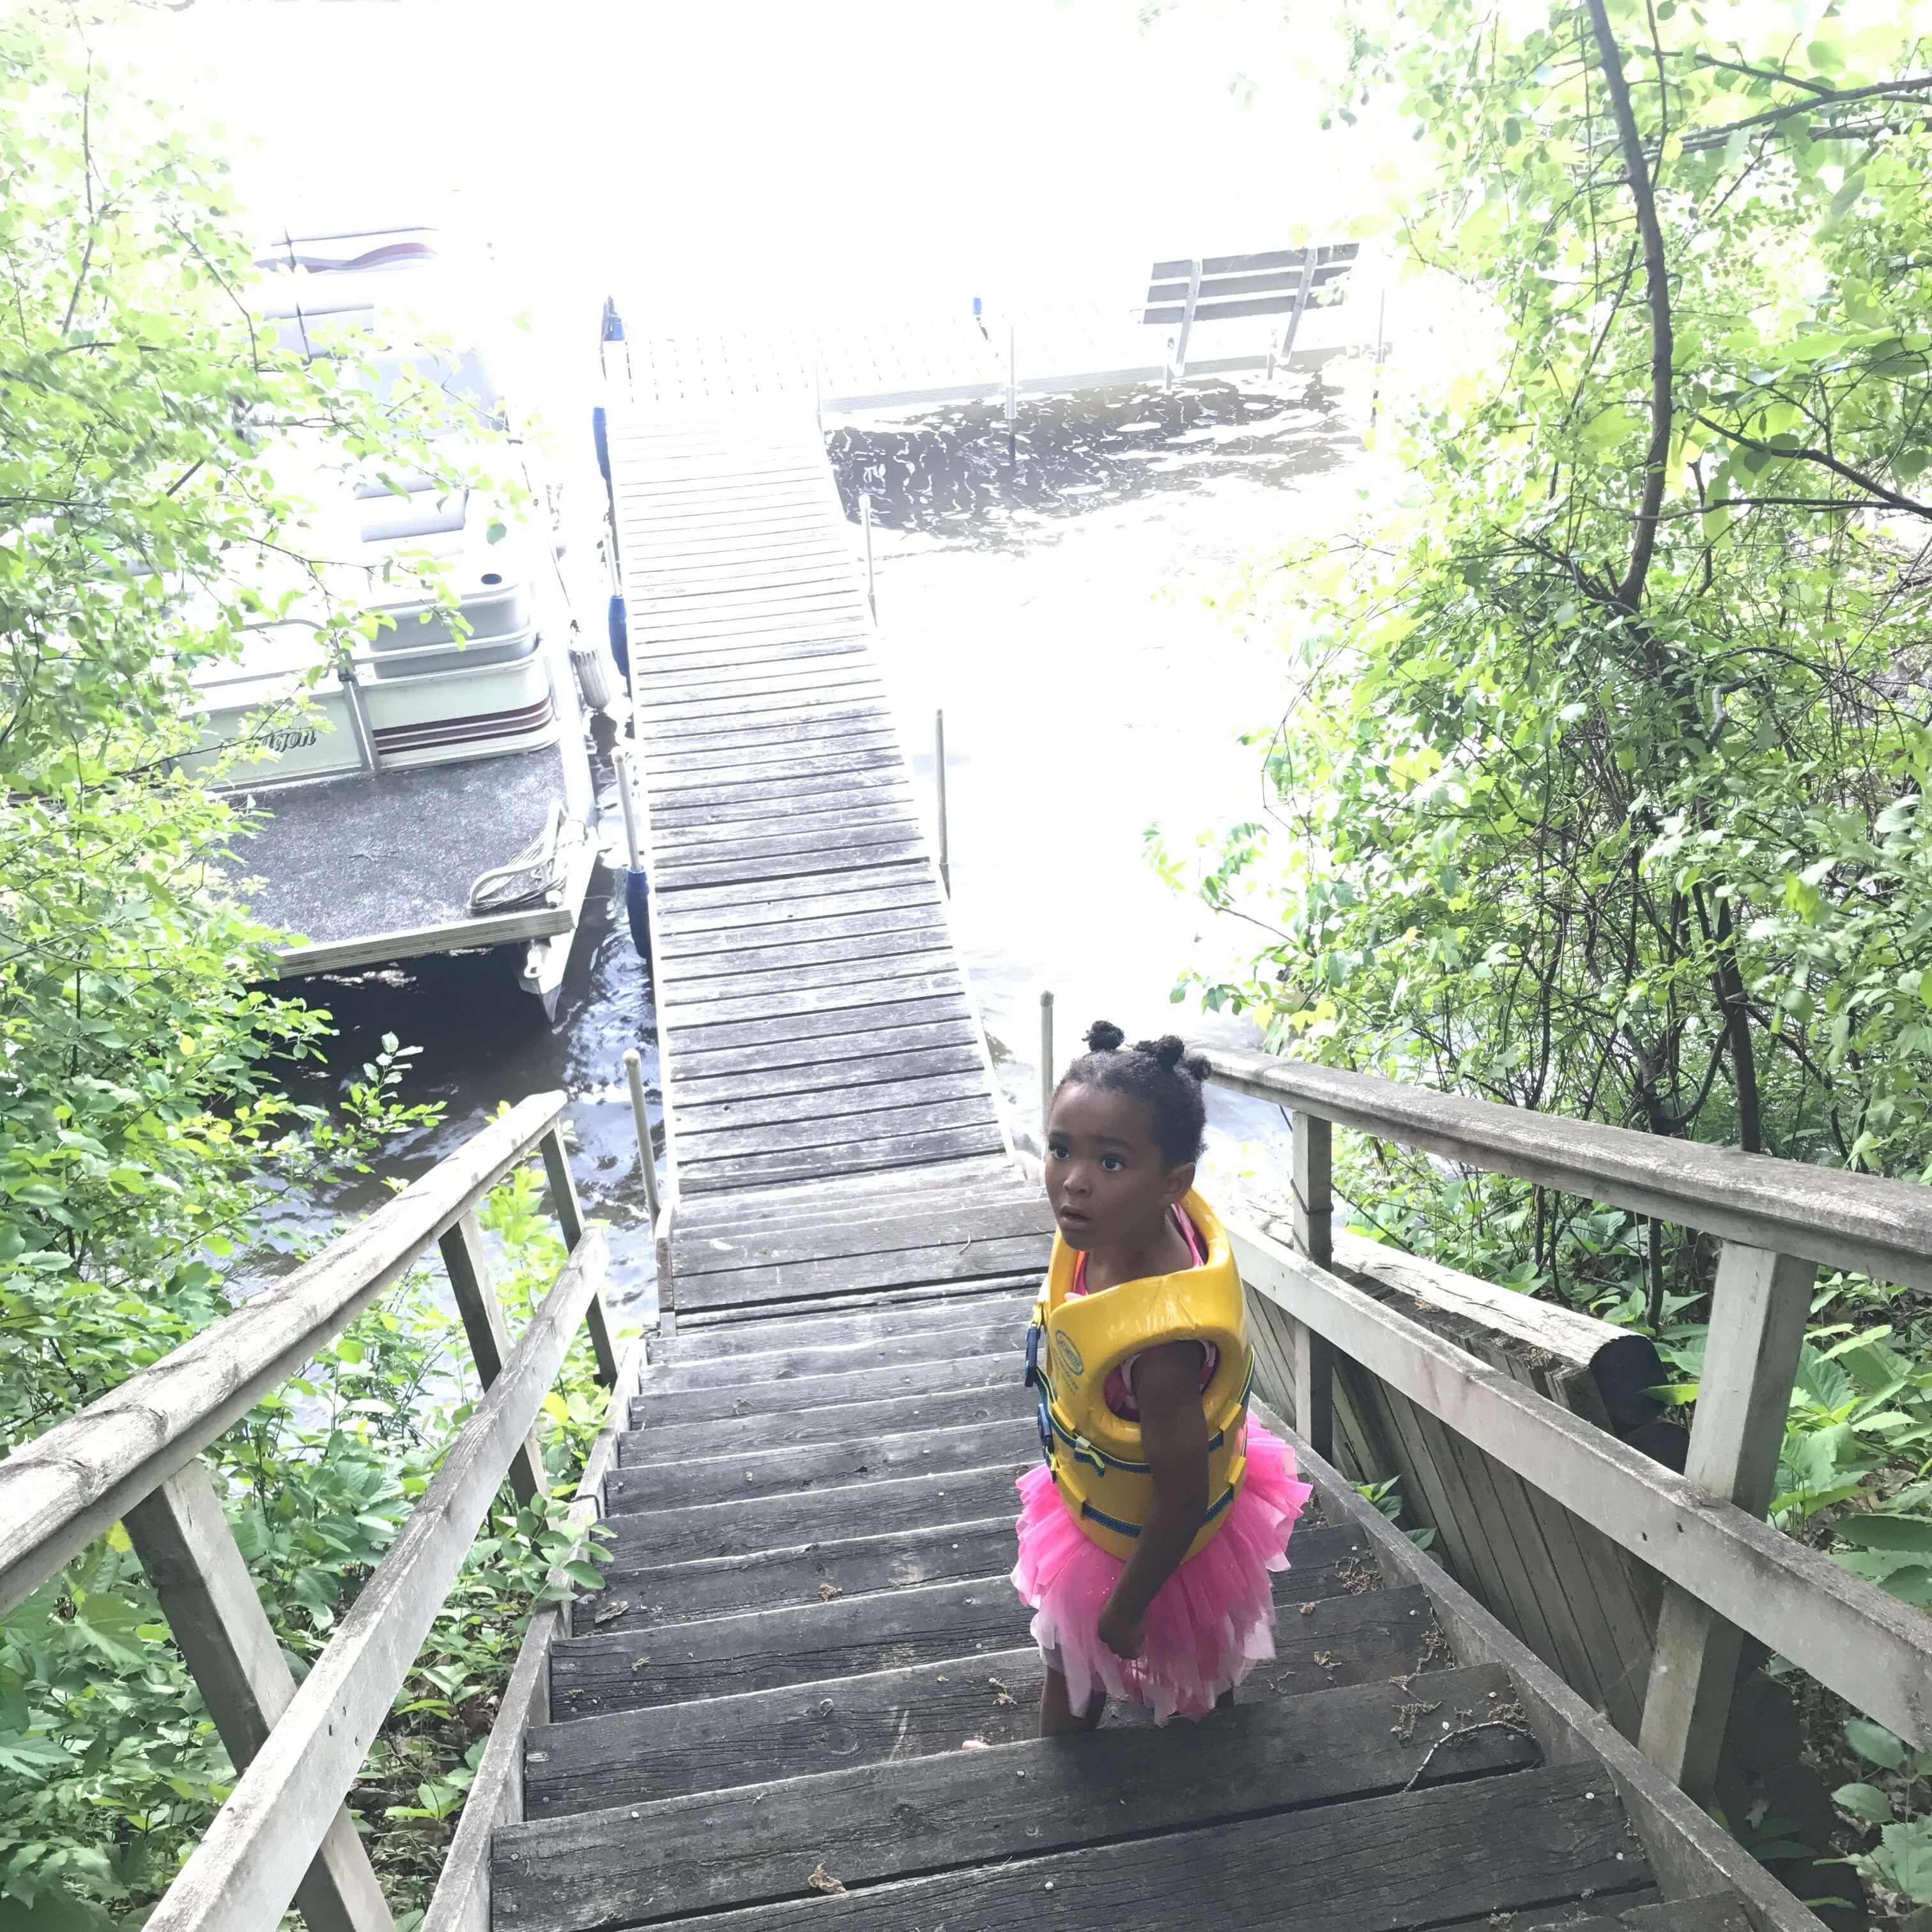 Foundation www.sarahkayhoffman.com Minnesota lake life Samarah #lifestyleblogger #home #lake #minnesota